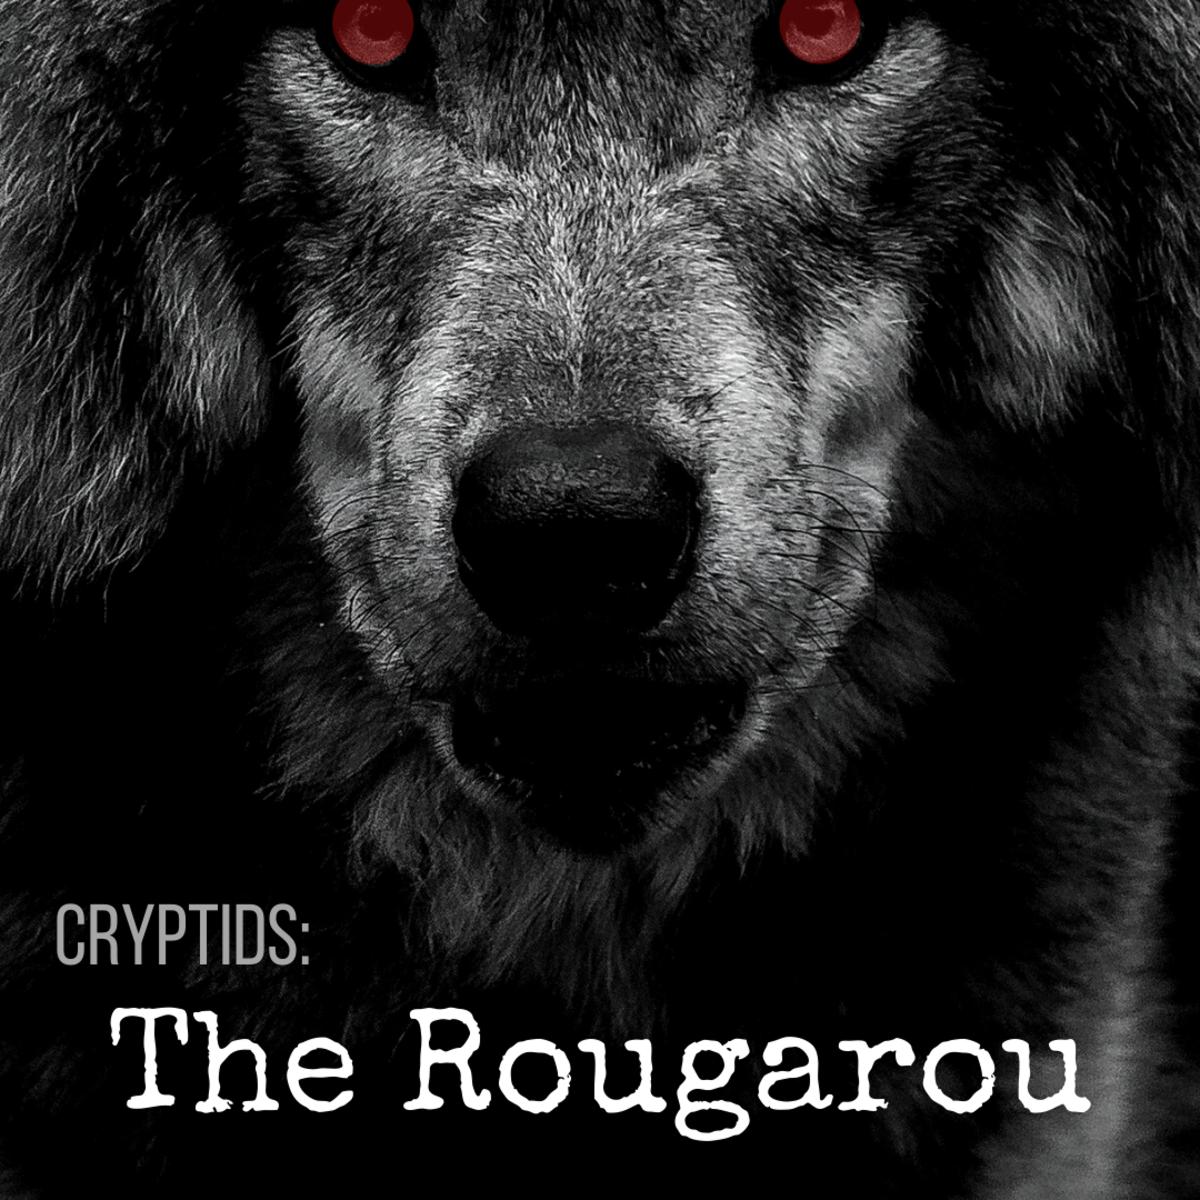 Discover Louisiana's legendary werewolf: the Rougarou.